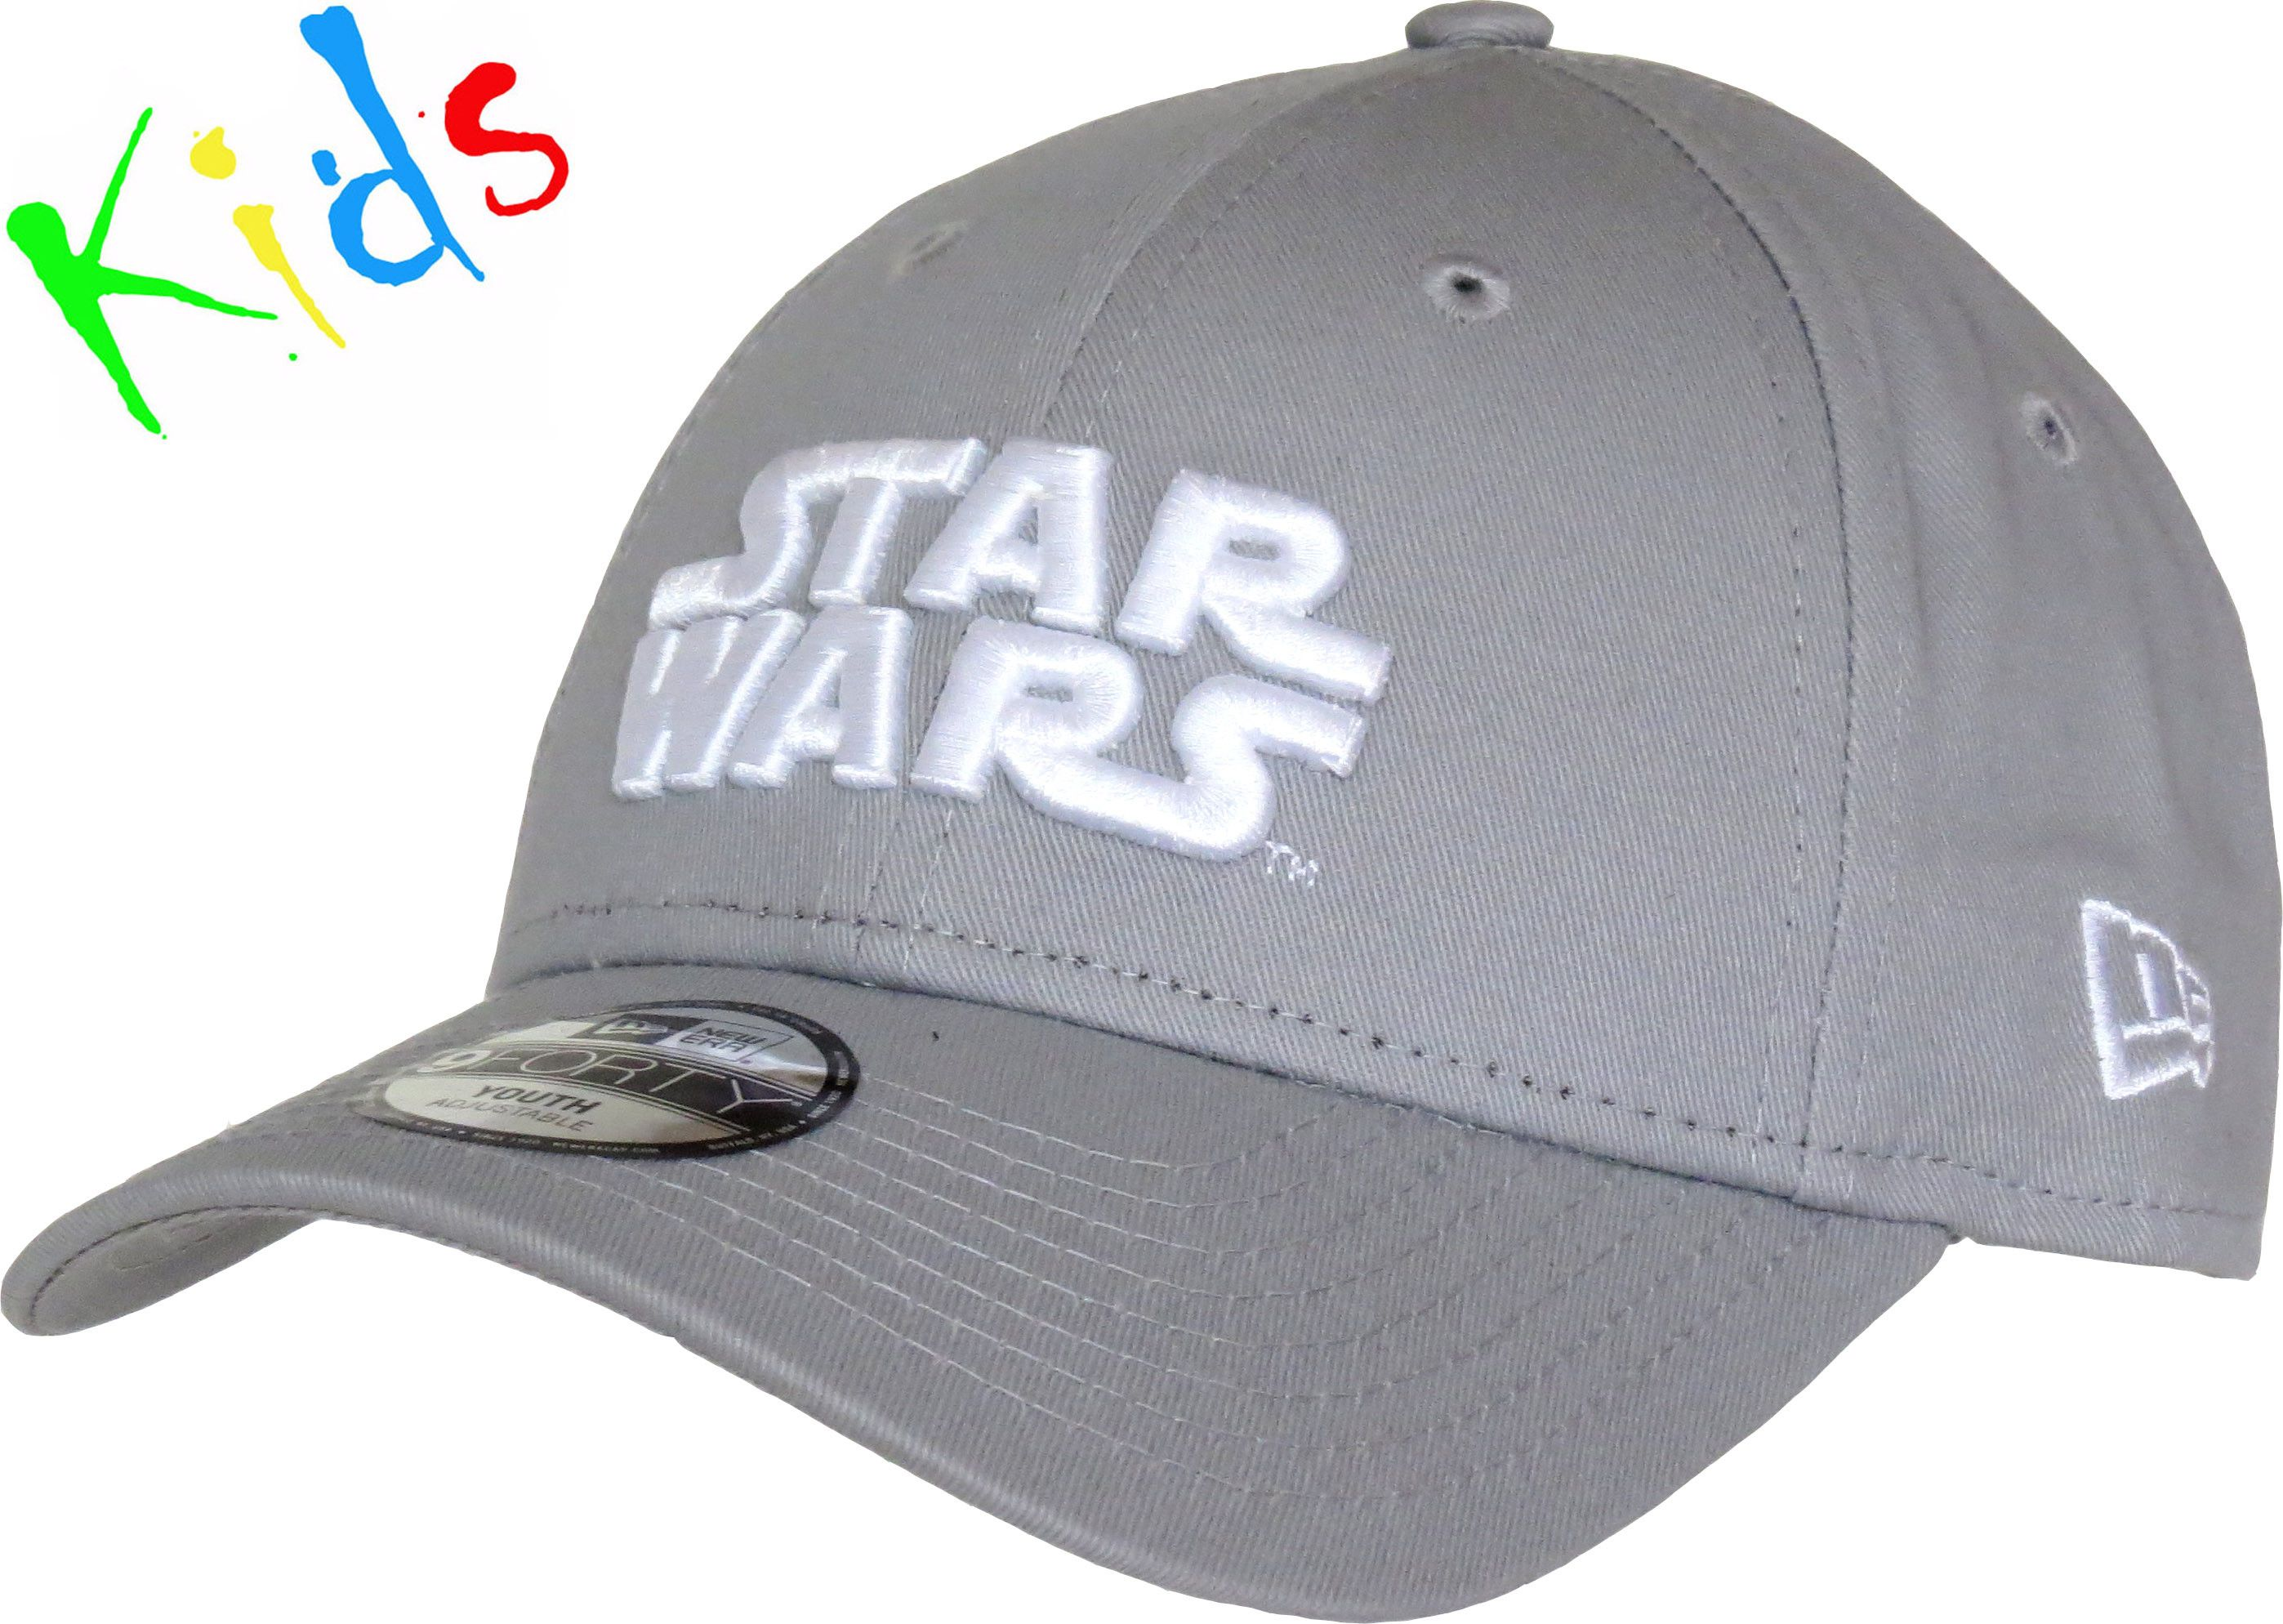 83b1940eb5c New Era Kids 940 Star Wars Essential Adjustable Baseball Cap. Grey with the  Star Wars